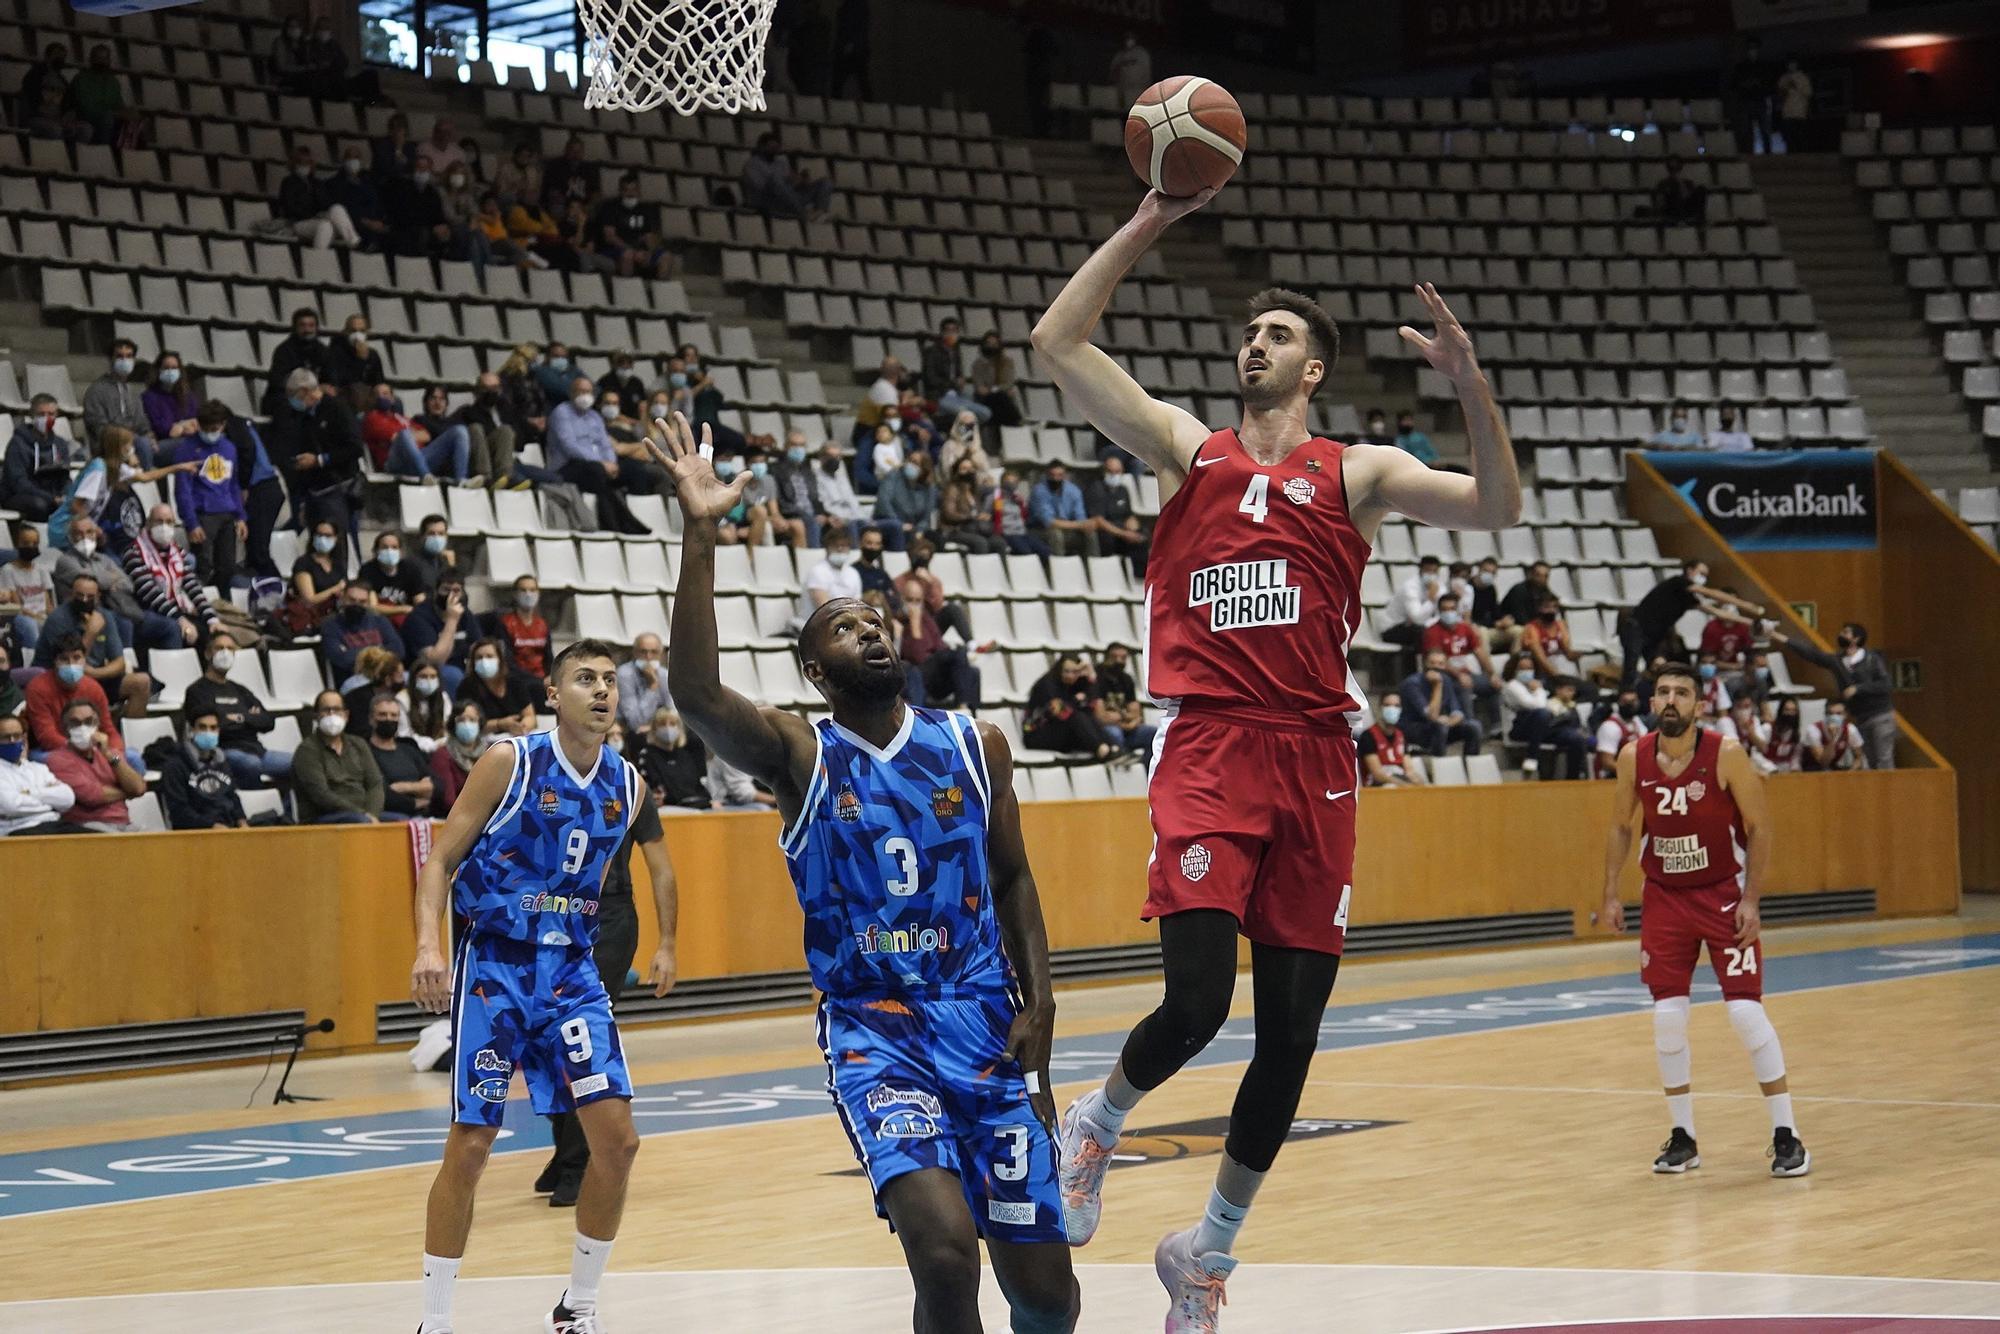 Un desencertat Bàsquet Girona perd a casa contra l'Almansa